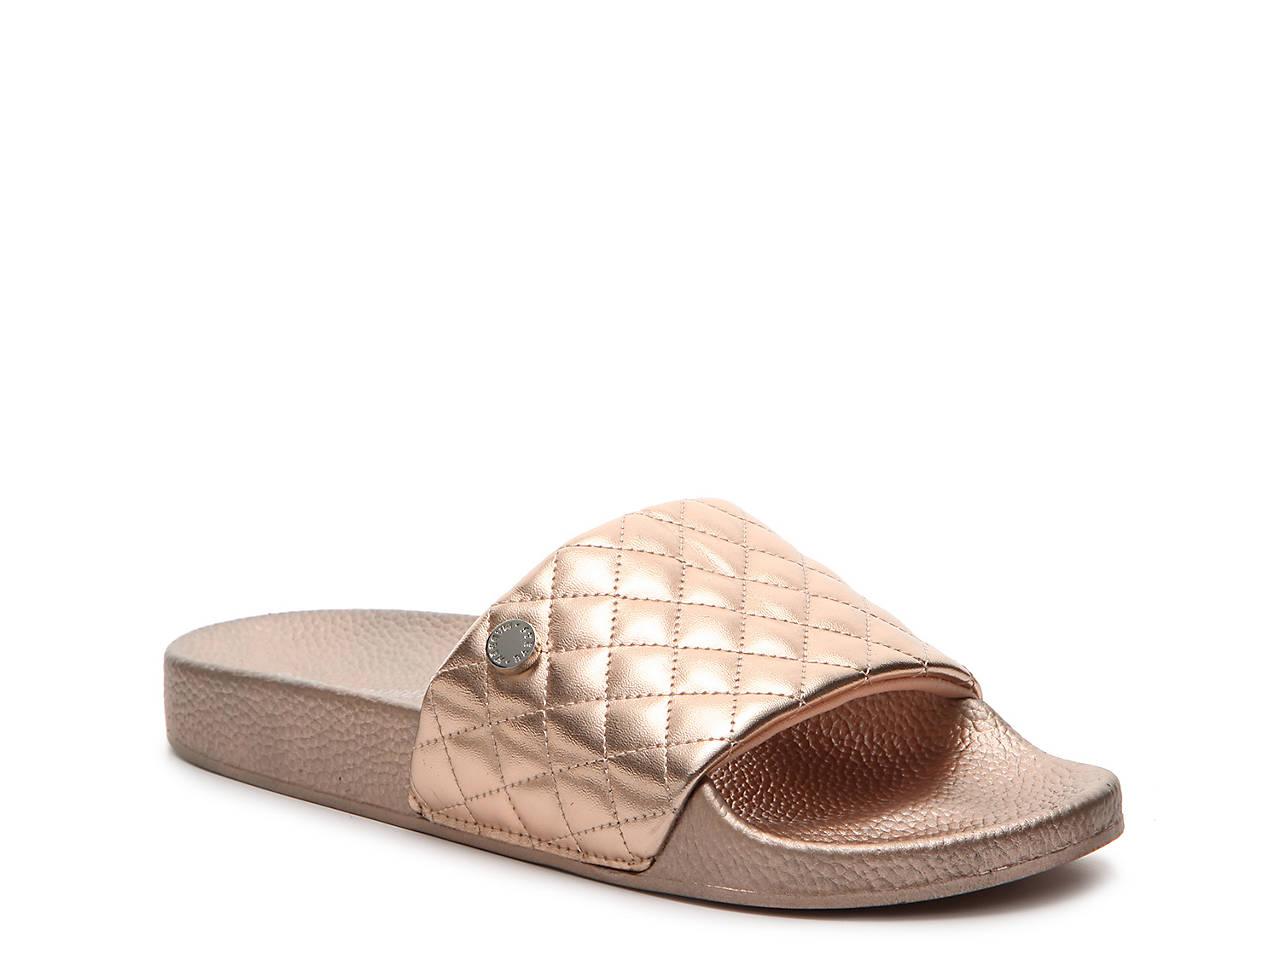 6a2bab322a4 Steve Madden Qool Slide Sandal Women s Shoes